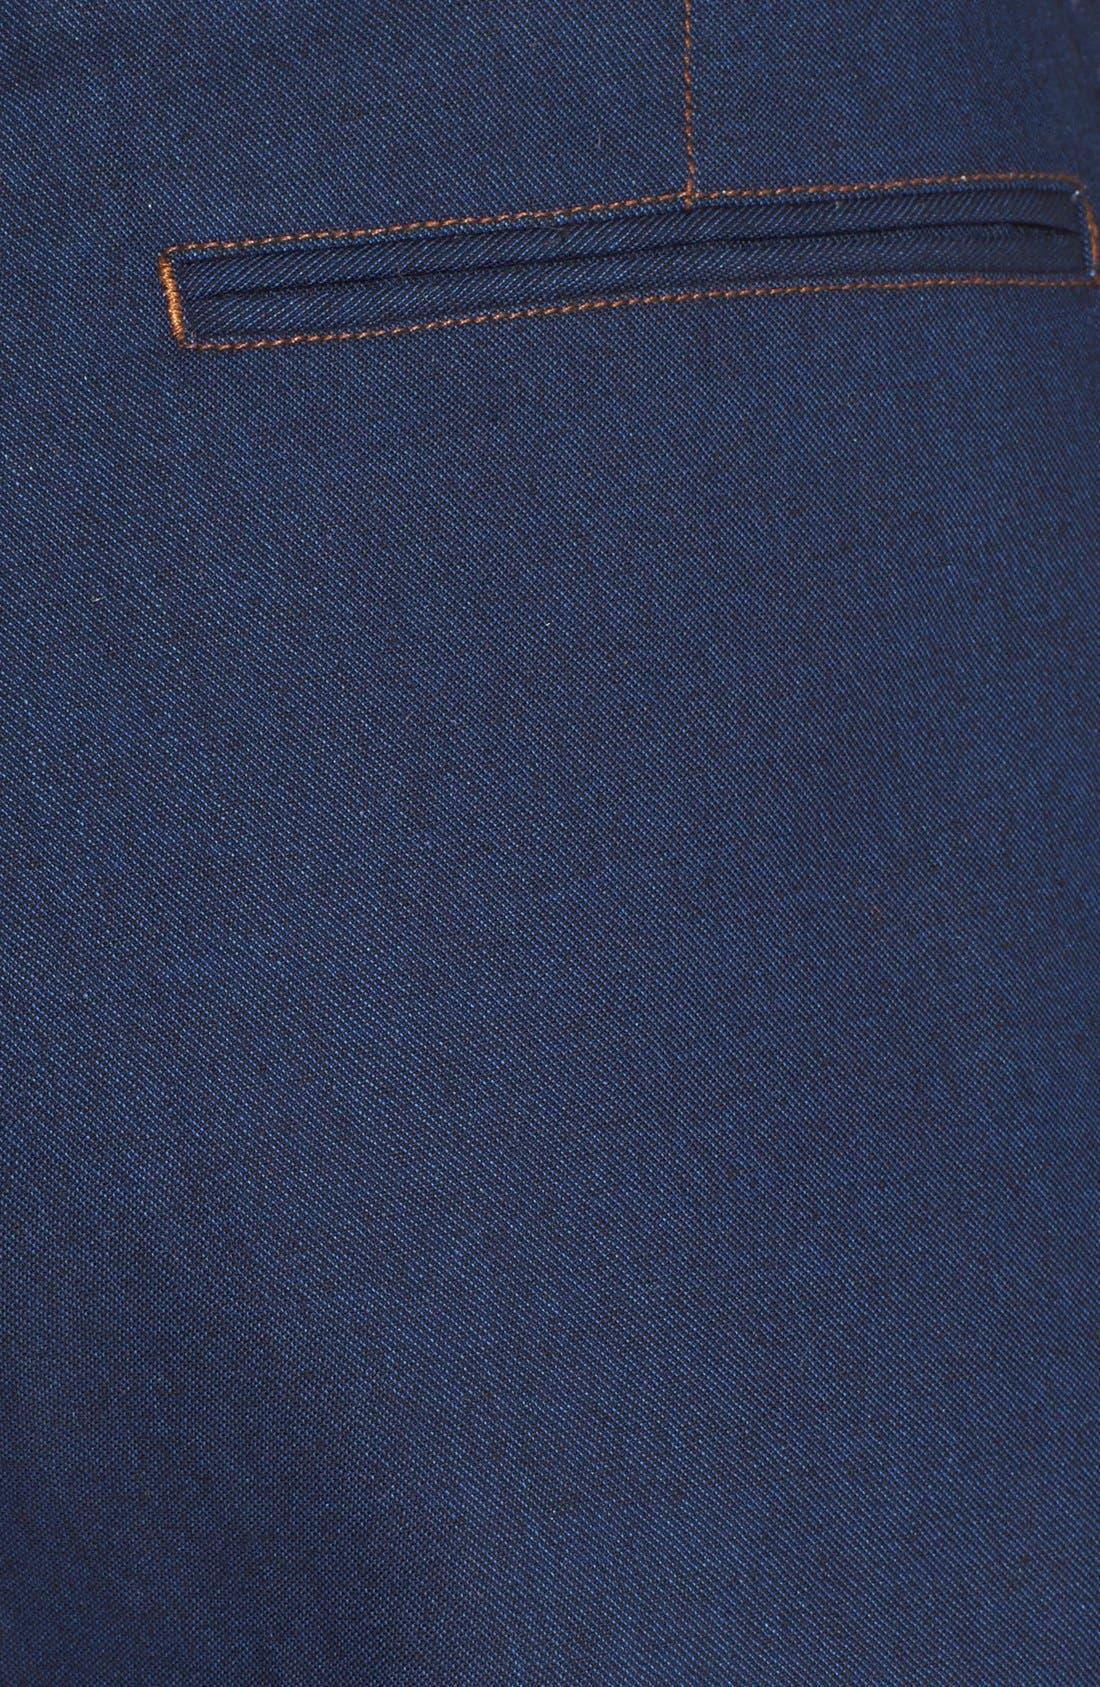 'Branson' High Waist Denim Shorts,                             Alternate thumbnail 3, color,                             417